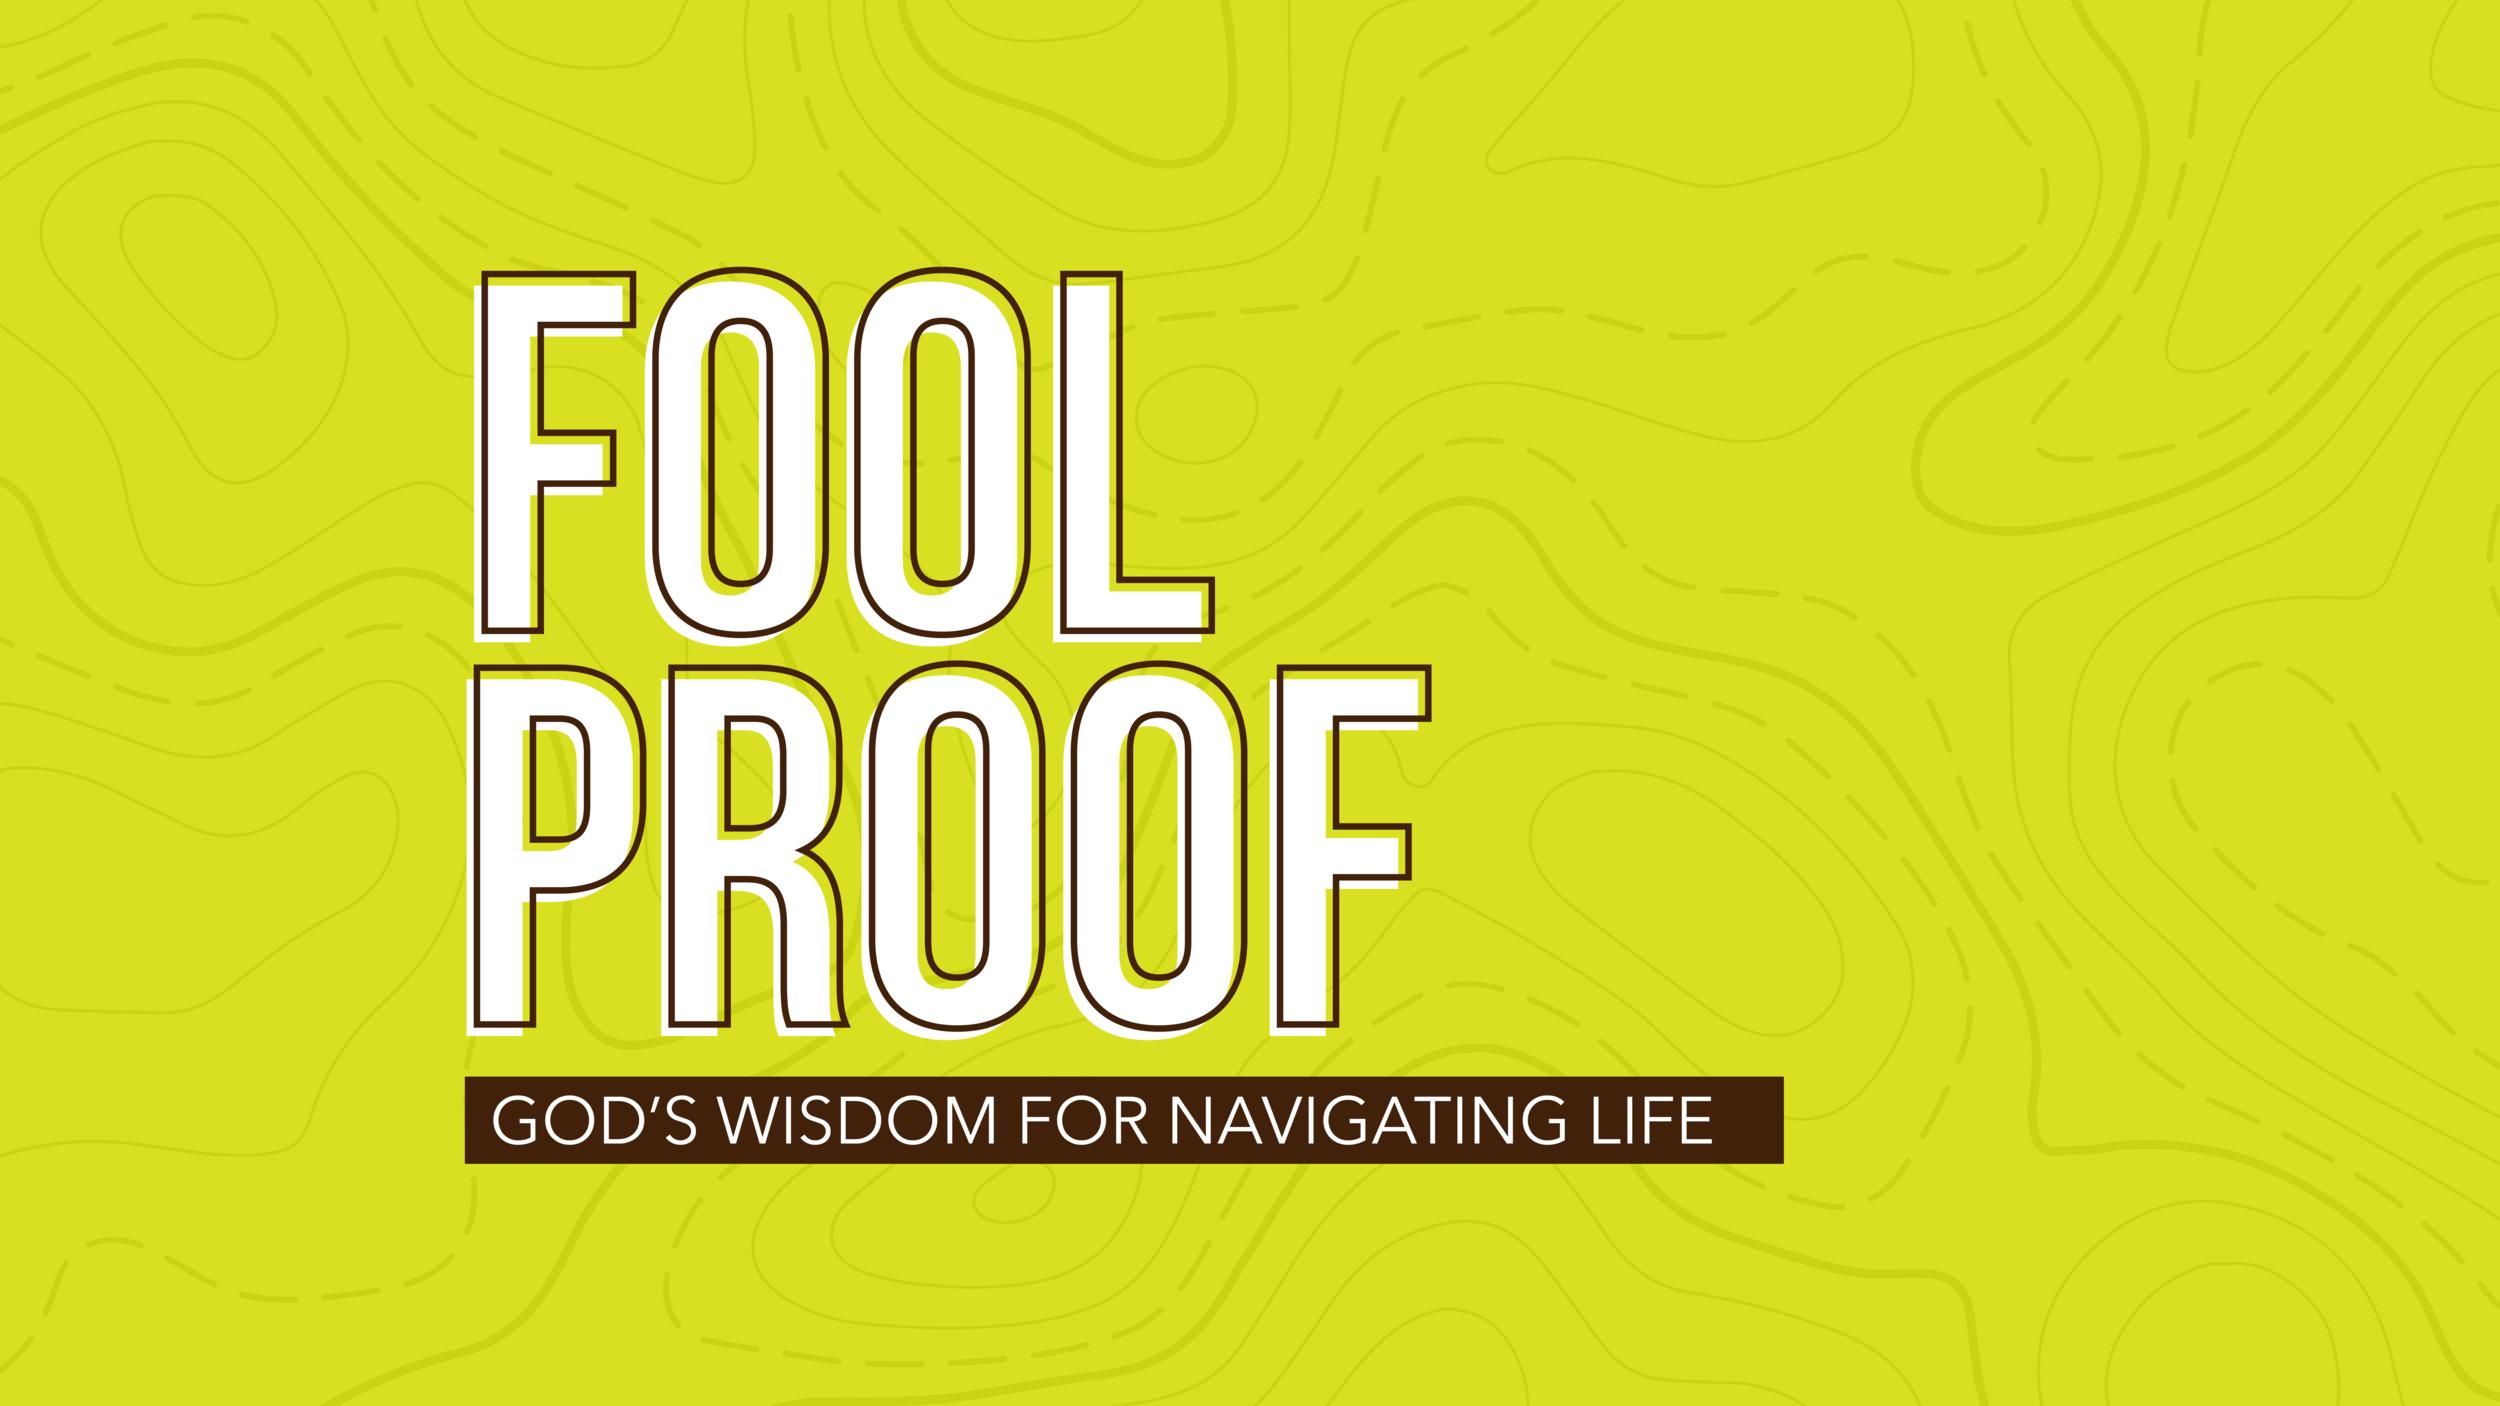 FOOLPROOF-01.png